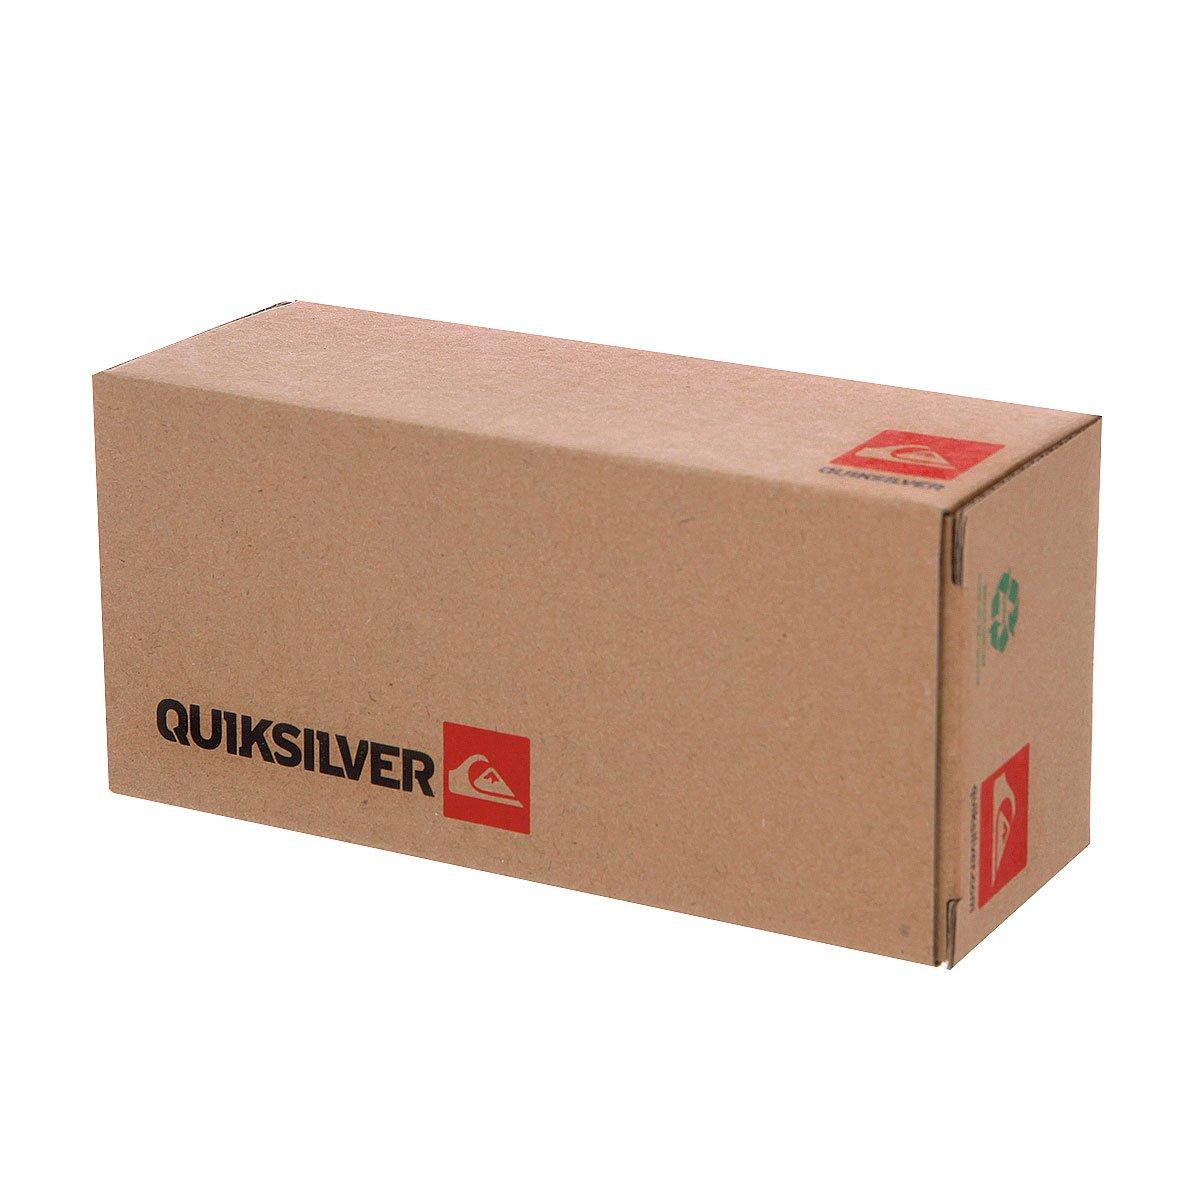 17c4b8f86997e Купить очки Quiksilver Murdoch Black Purple (EQYEY00024-XKKP) в ...